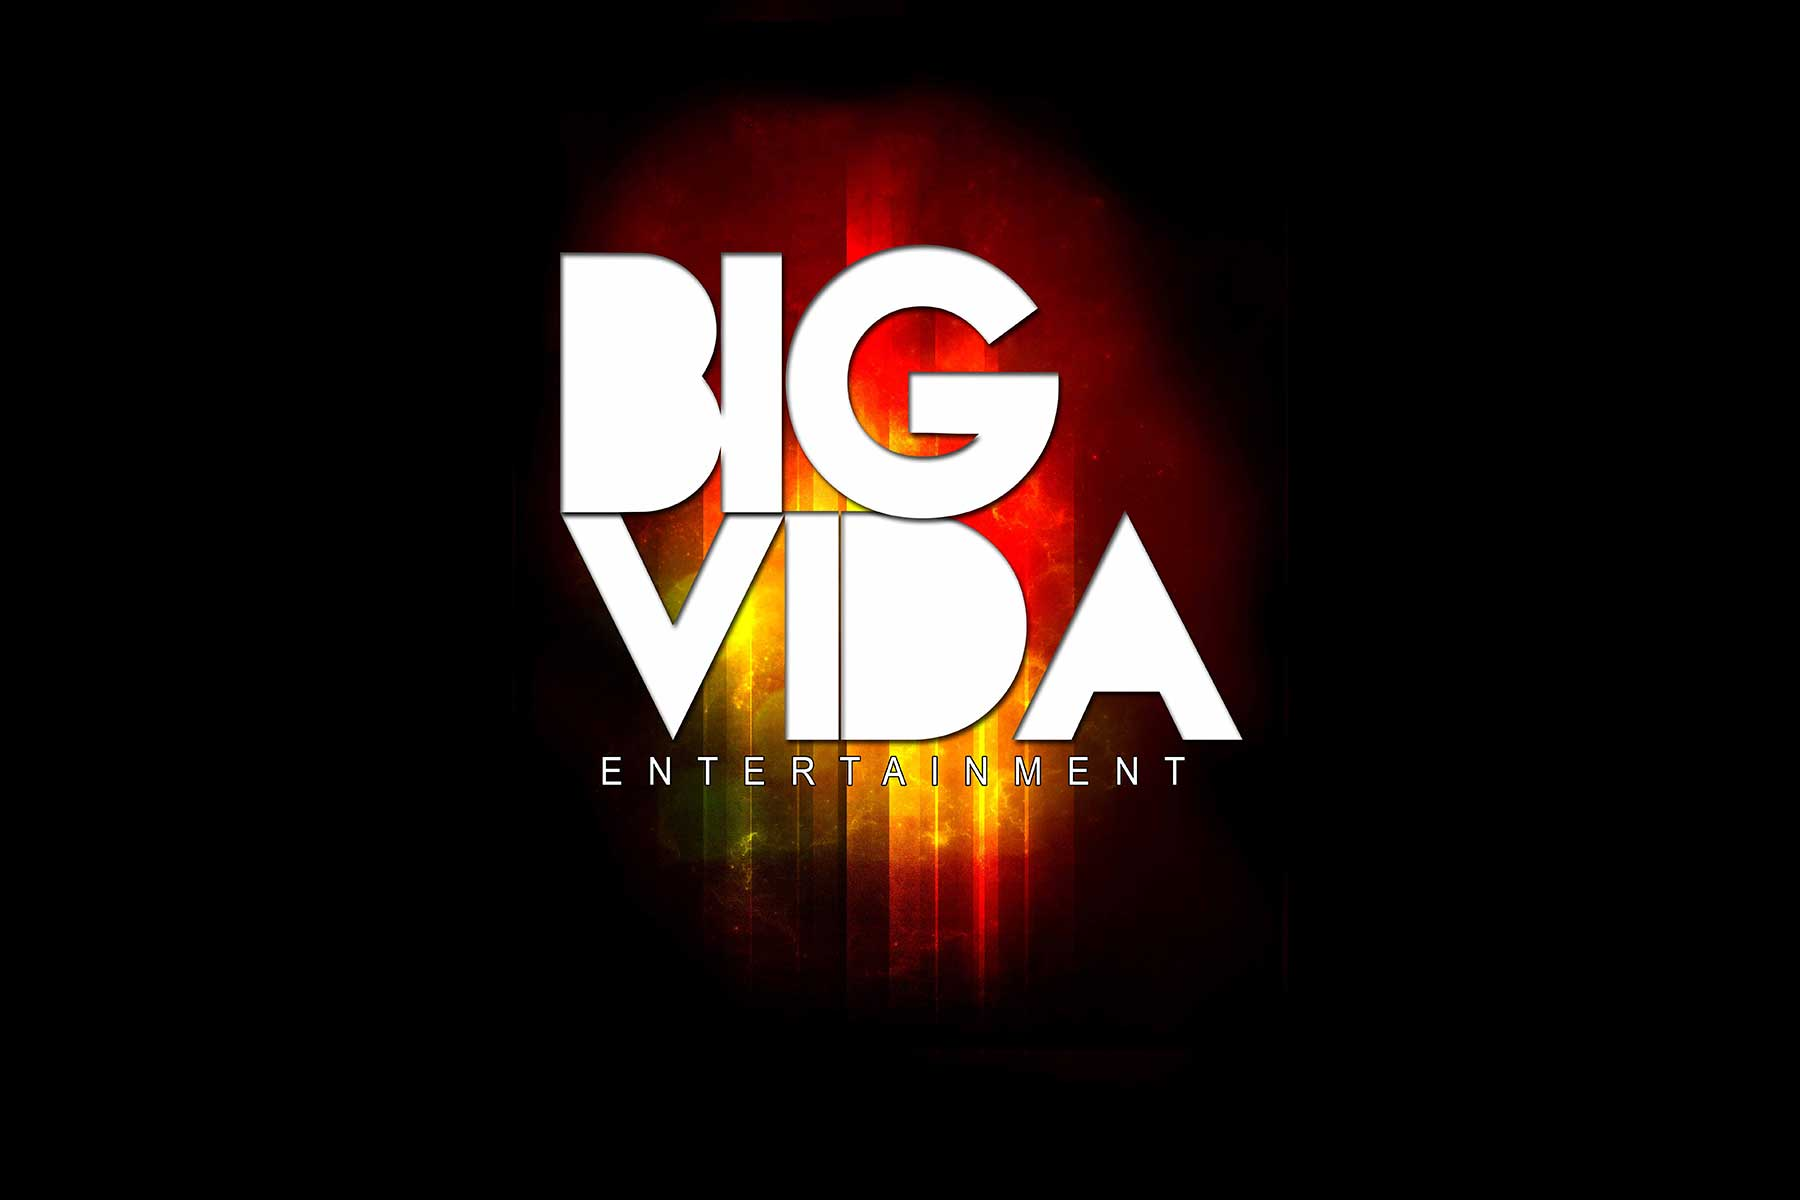 BigVidaEnt.JPG